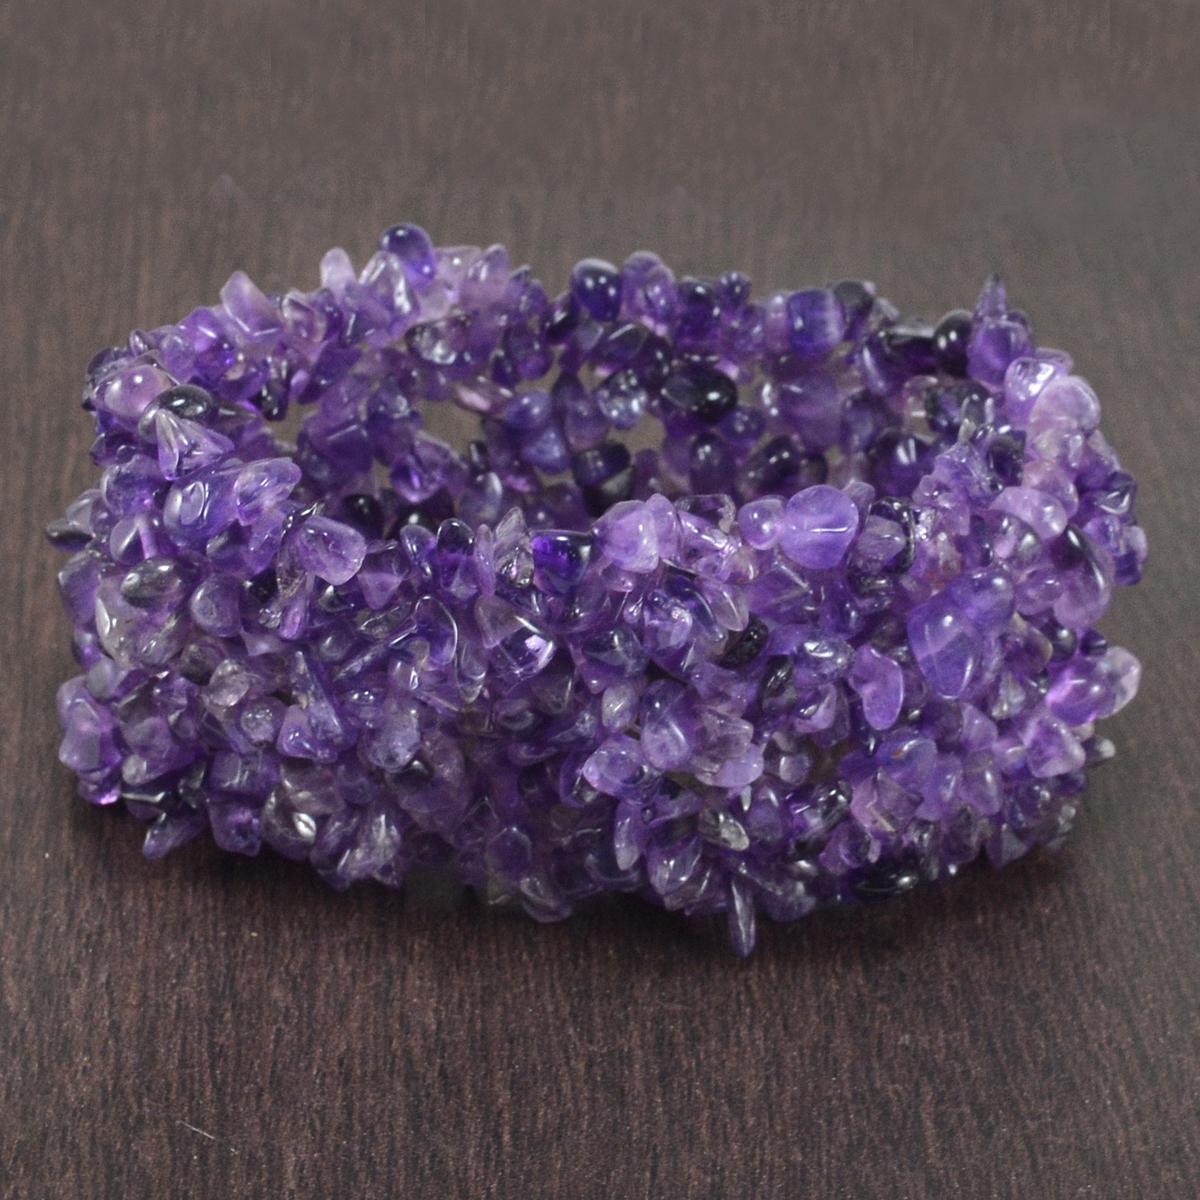 Handmade Jewelry Manufacturer Purple Amethyst Gemstone Chips Jaipur Rajasthan India Stretchable Bracelet